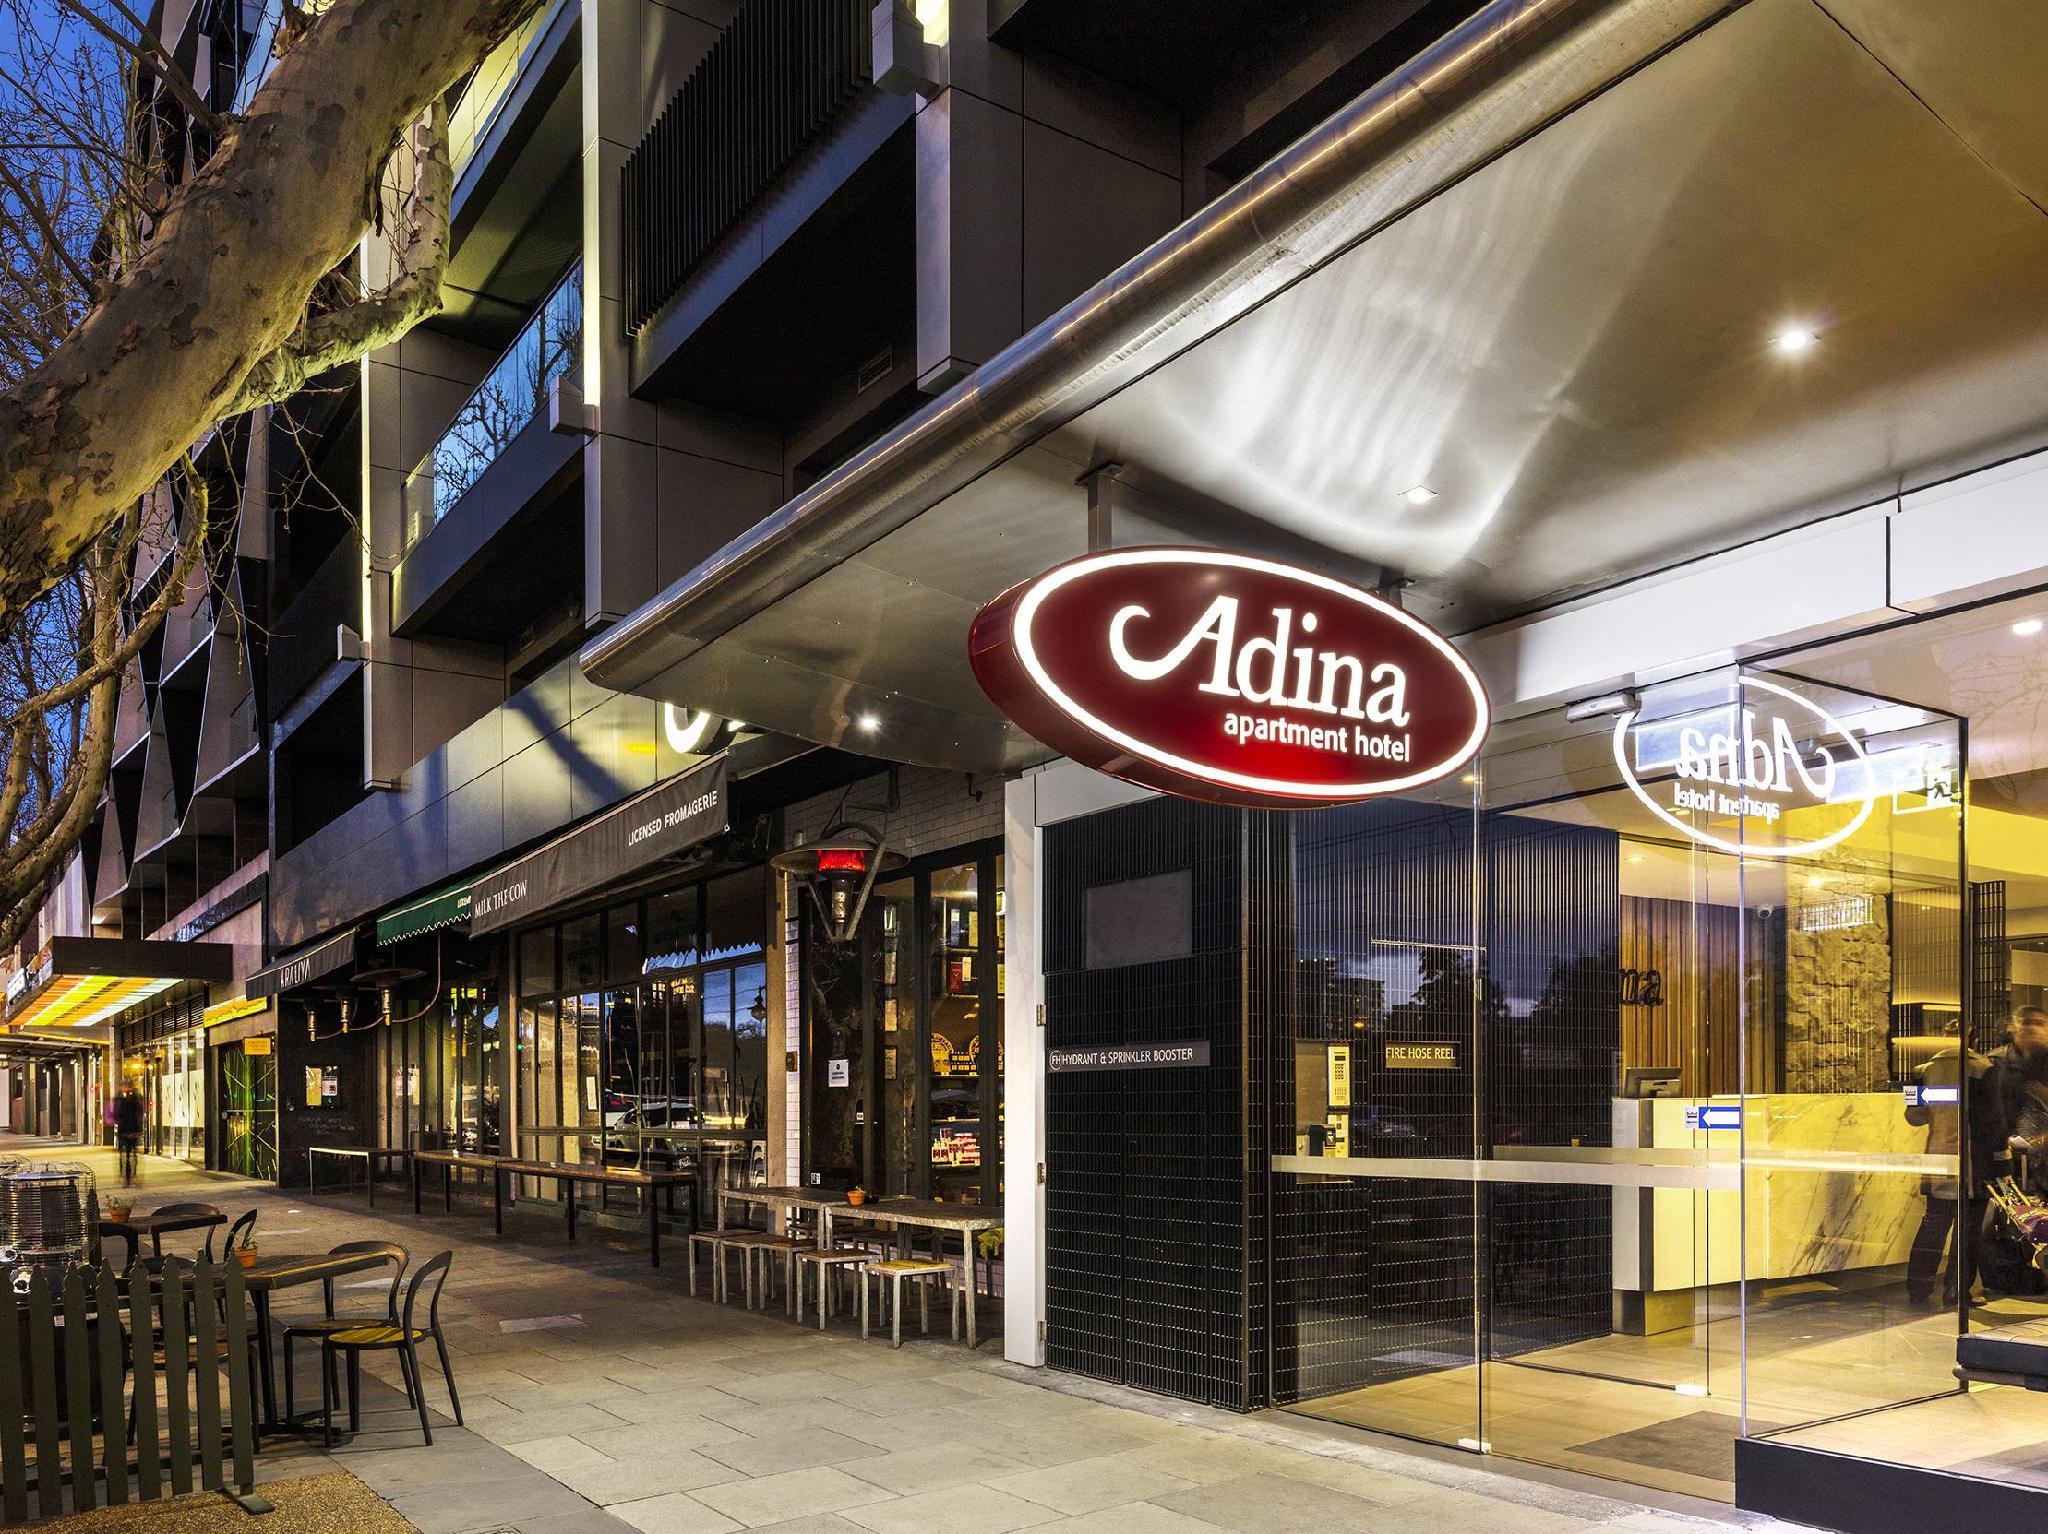 Lovely Adina Apartment Hotel St Kilda Melbourne